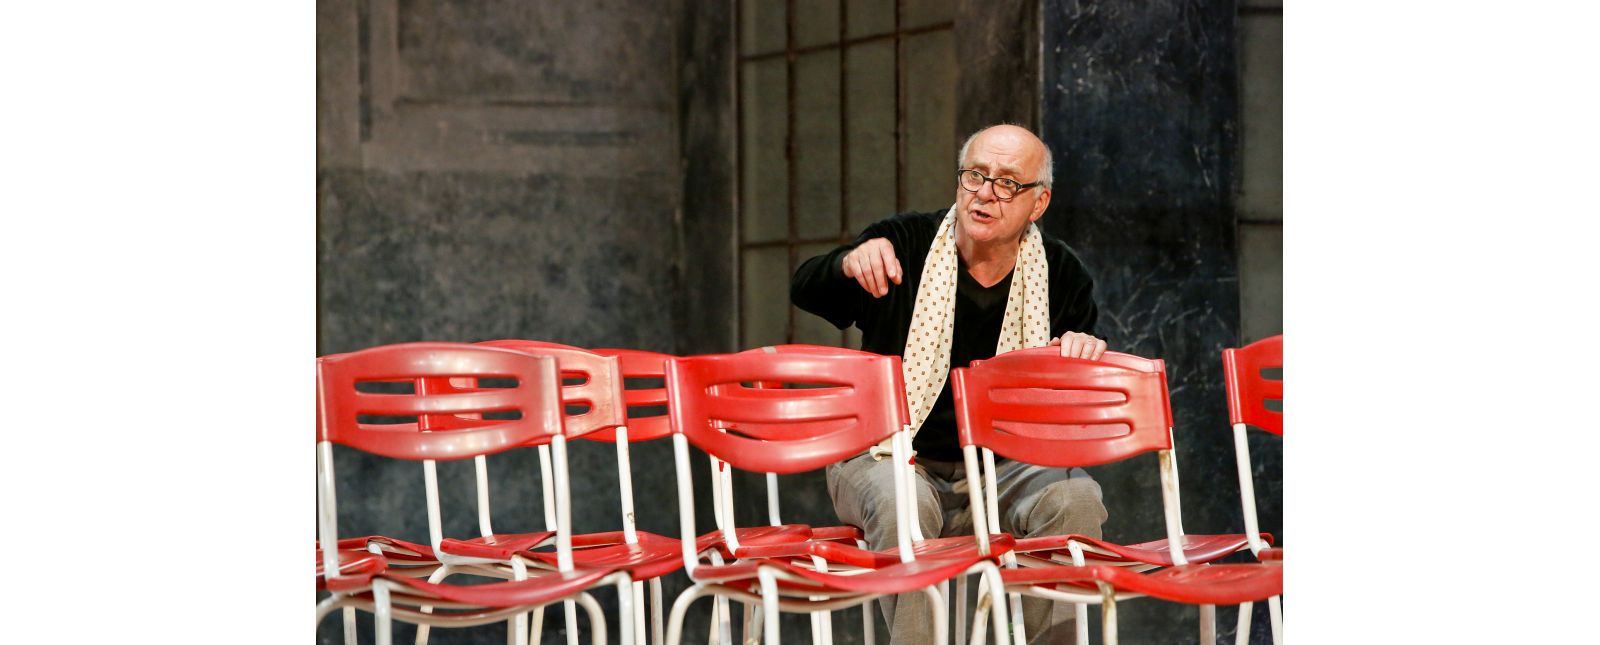 Der Theatermacher // Hartmut Stanke // 2017 // Birgit Hupfeld